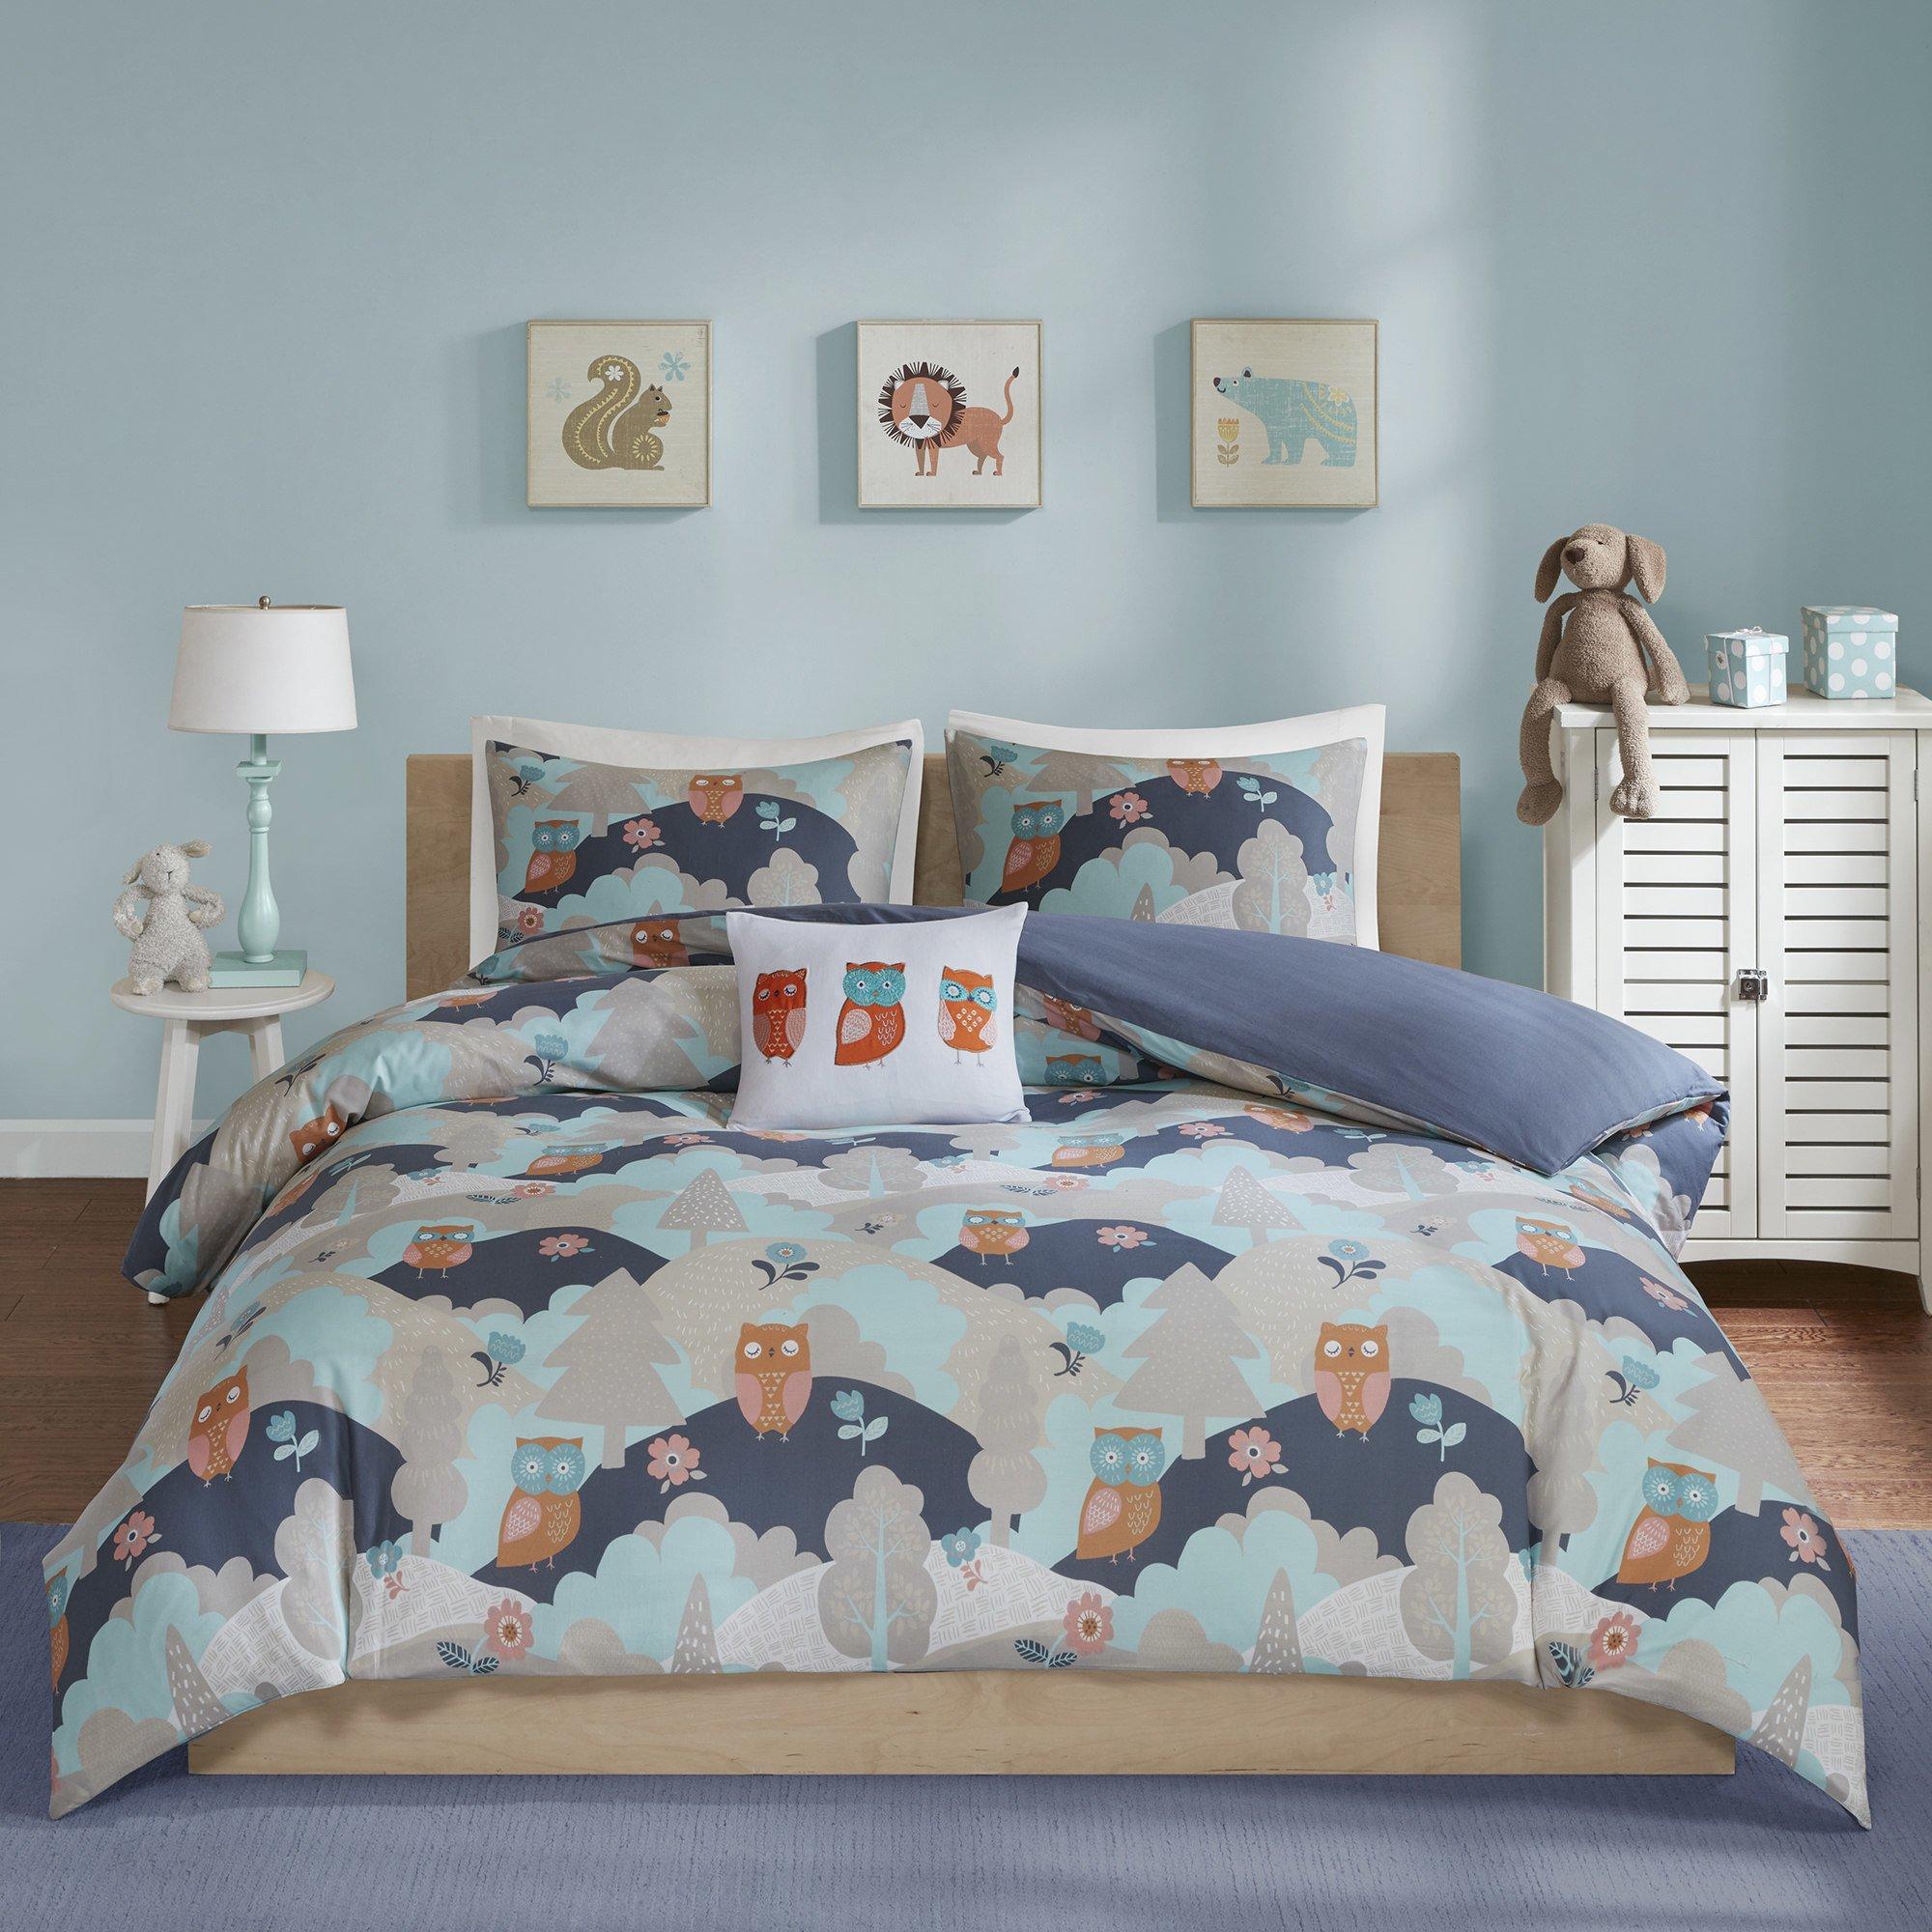 4 Piece Girls Navy Grey Orange Owls Design Comforter Full Queen Set, Multi Color Novelty Themed Bird Animal Rolling Hills Lush Trees Printed, Reversible Blue Kids Bedding Teen Bedroom, Percale Cotton